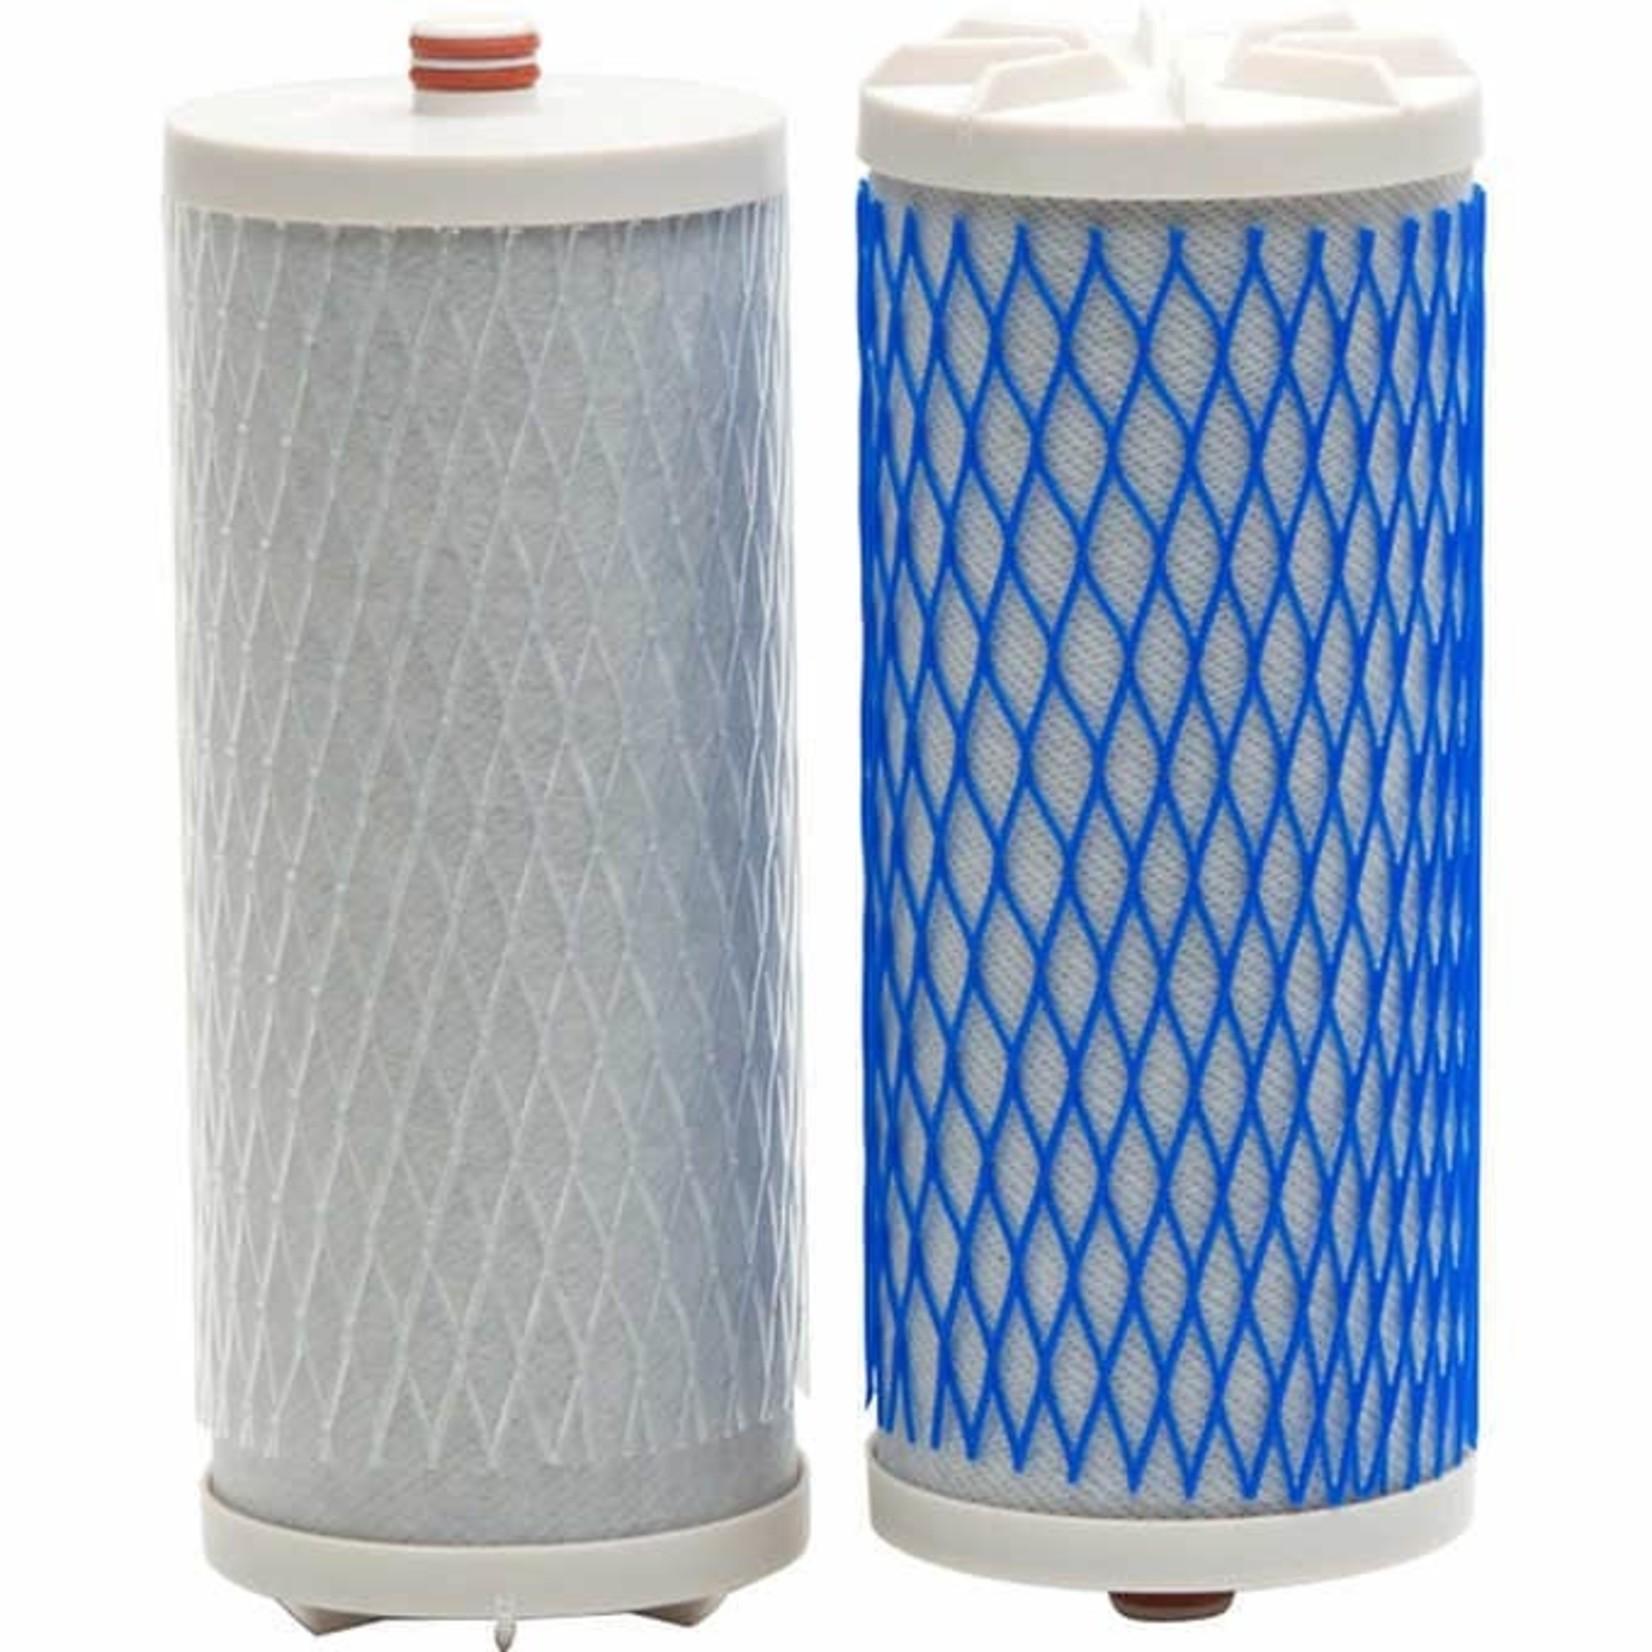 Austin Springs Drinking Water Replacement Filters - Dual Cartridge Set